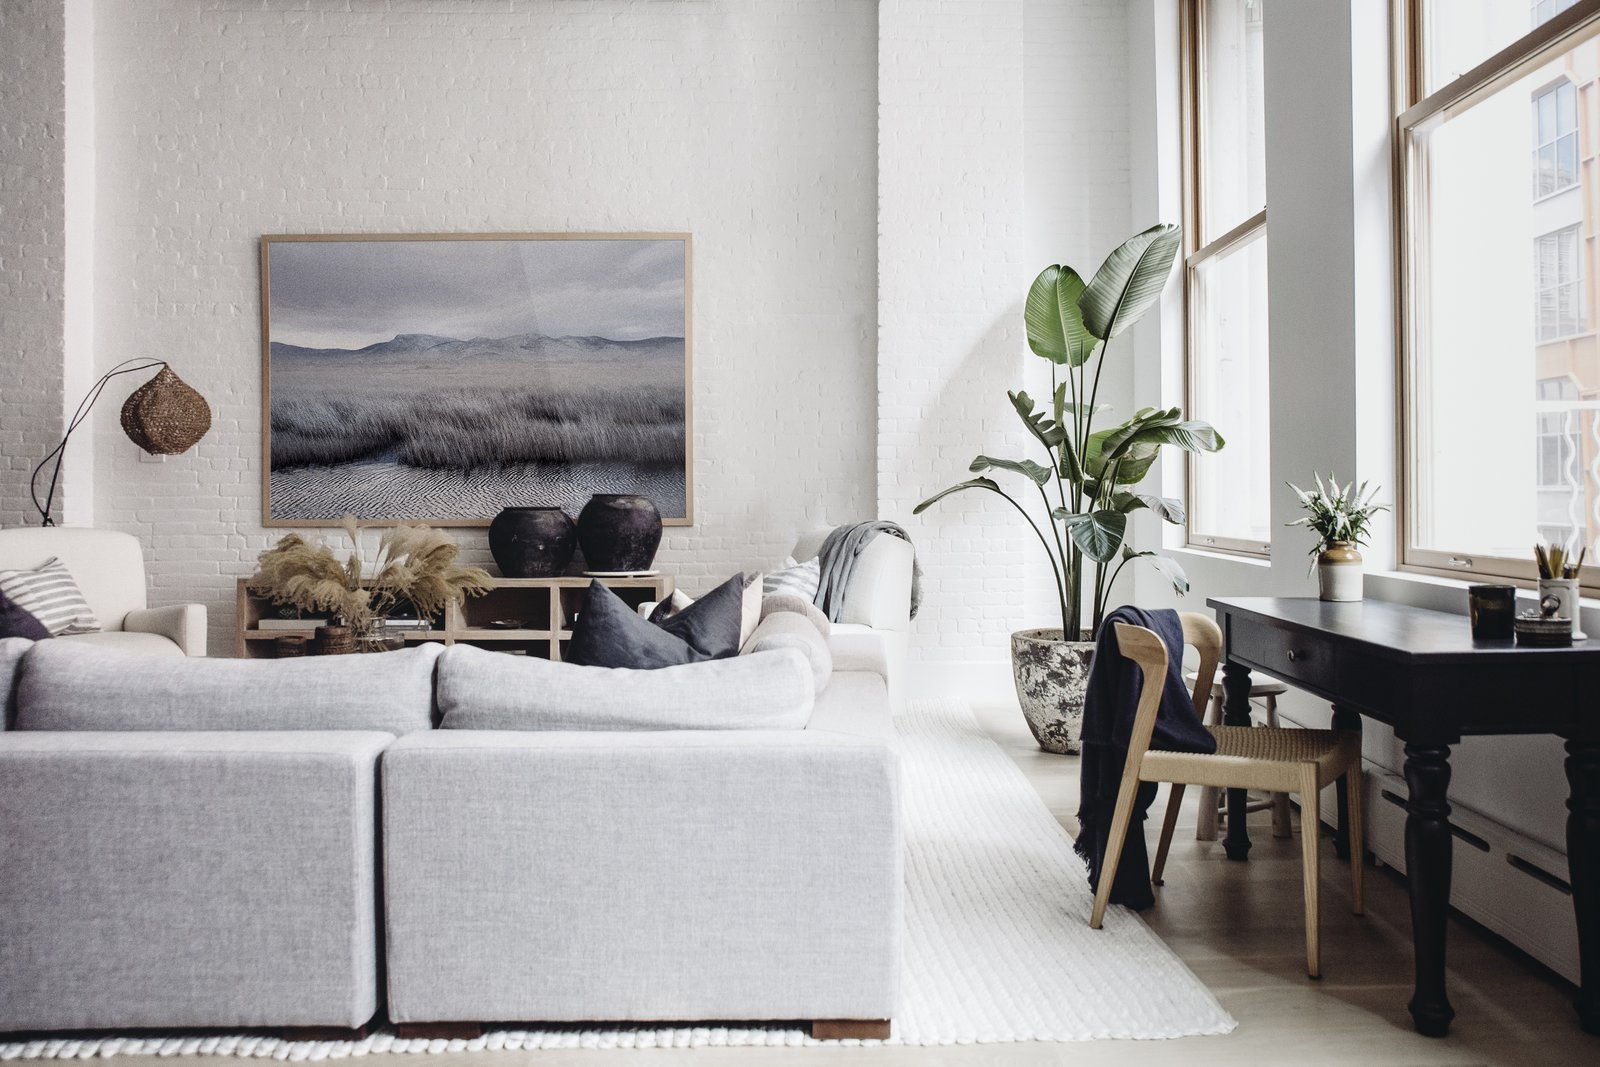 SoHo Loft living room